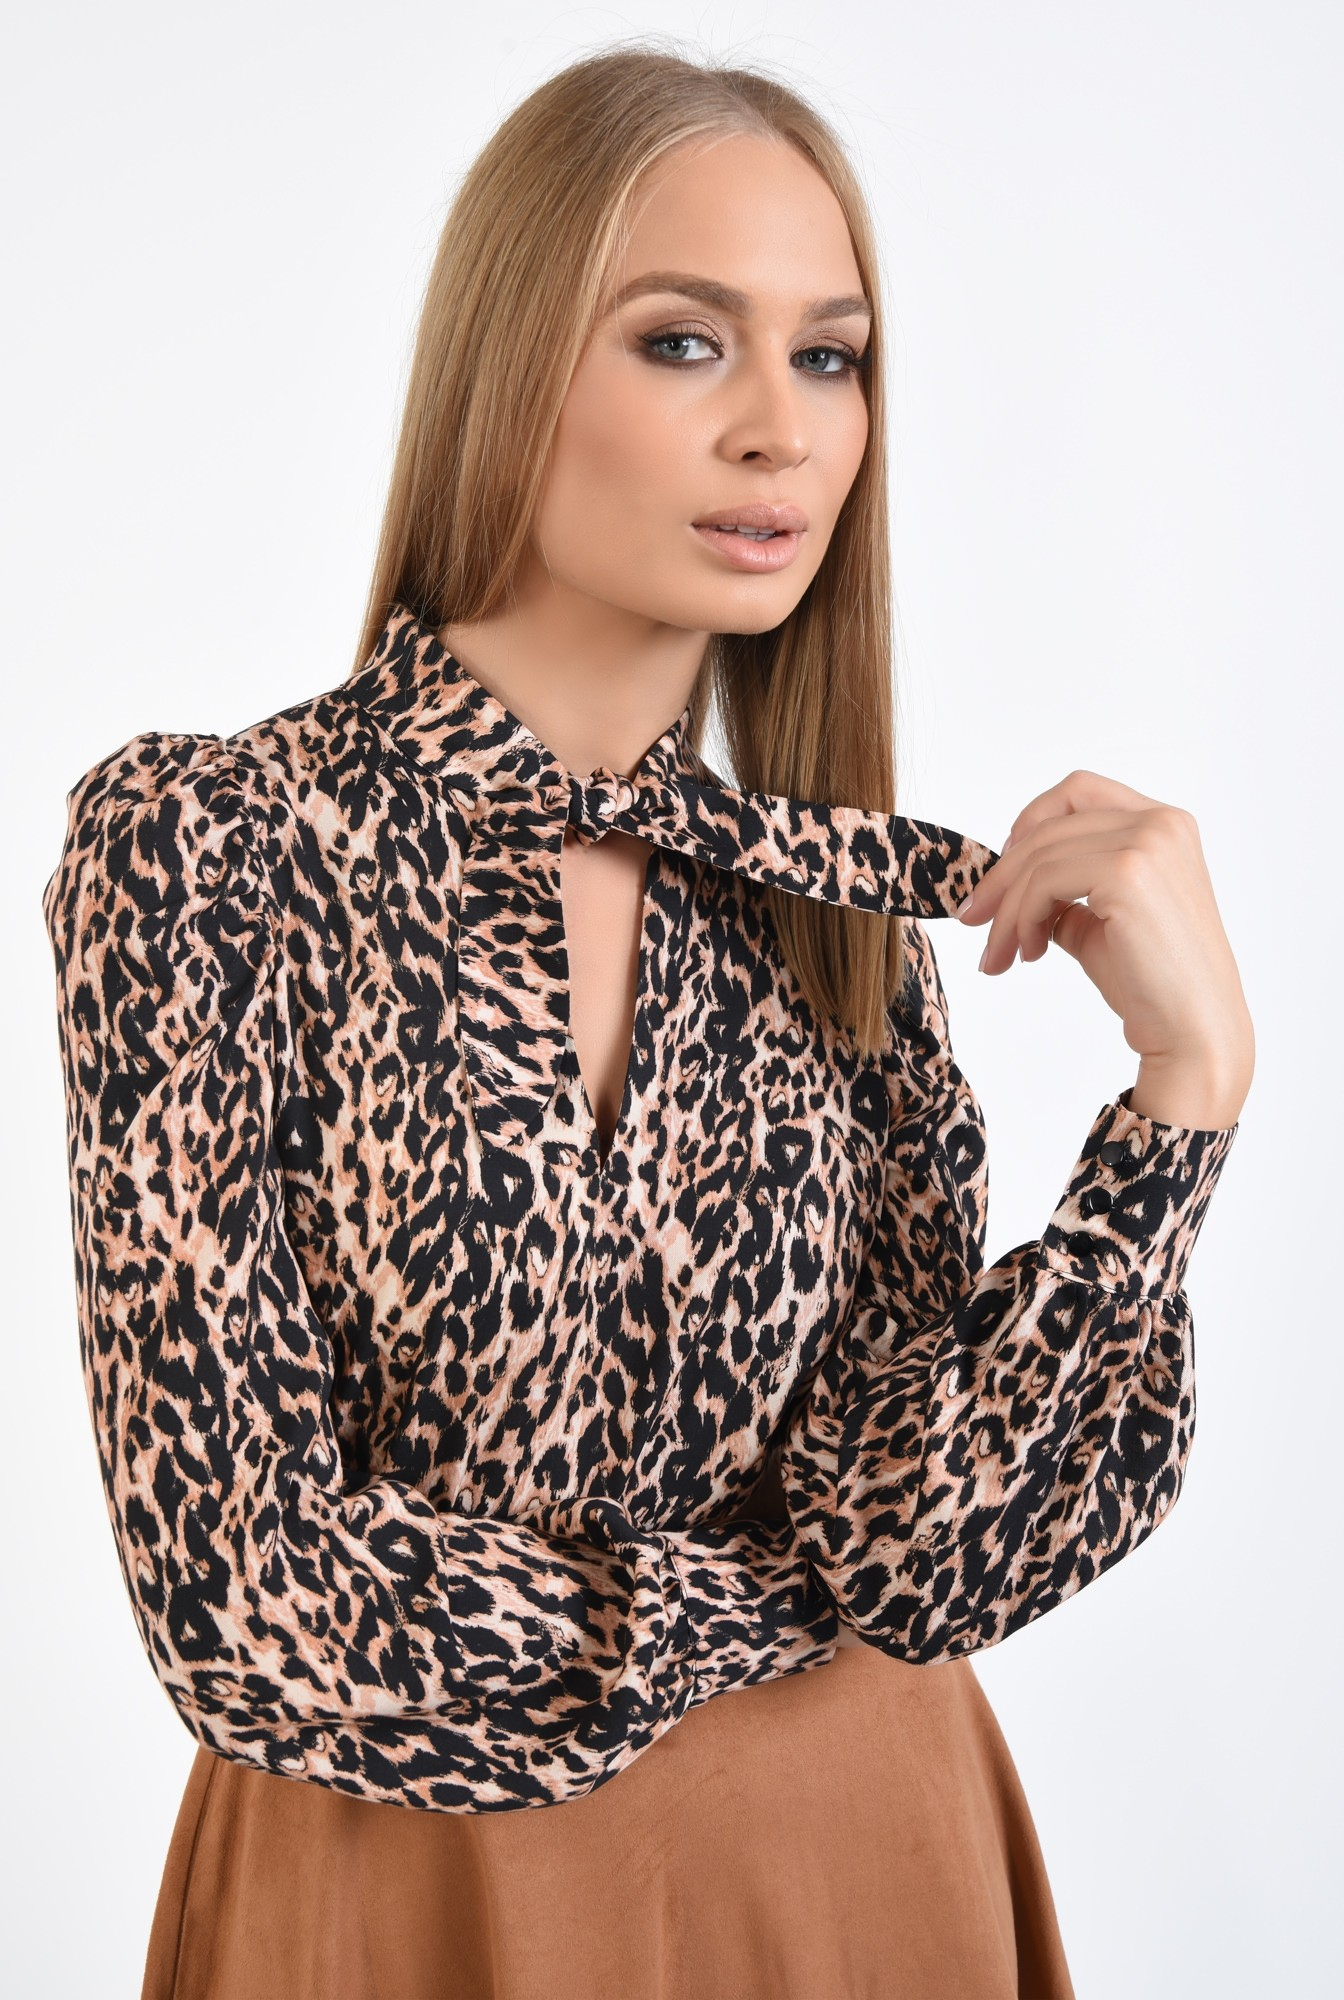 2 - bluza animal print, leopard, imprimeu, maneci lungi